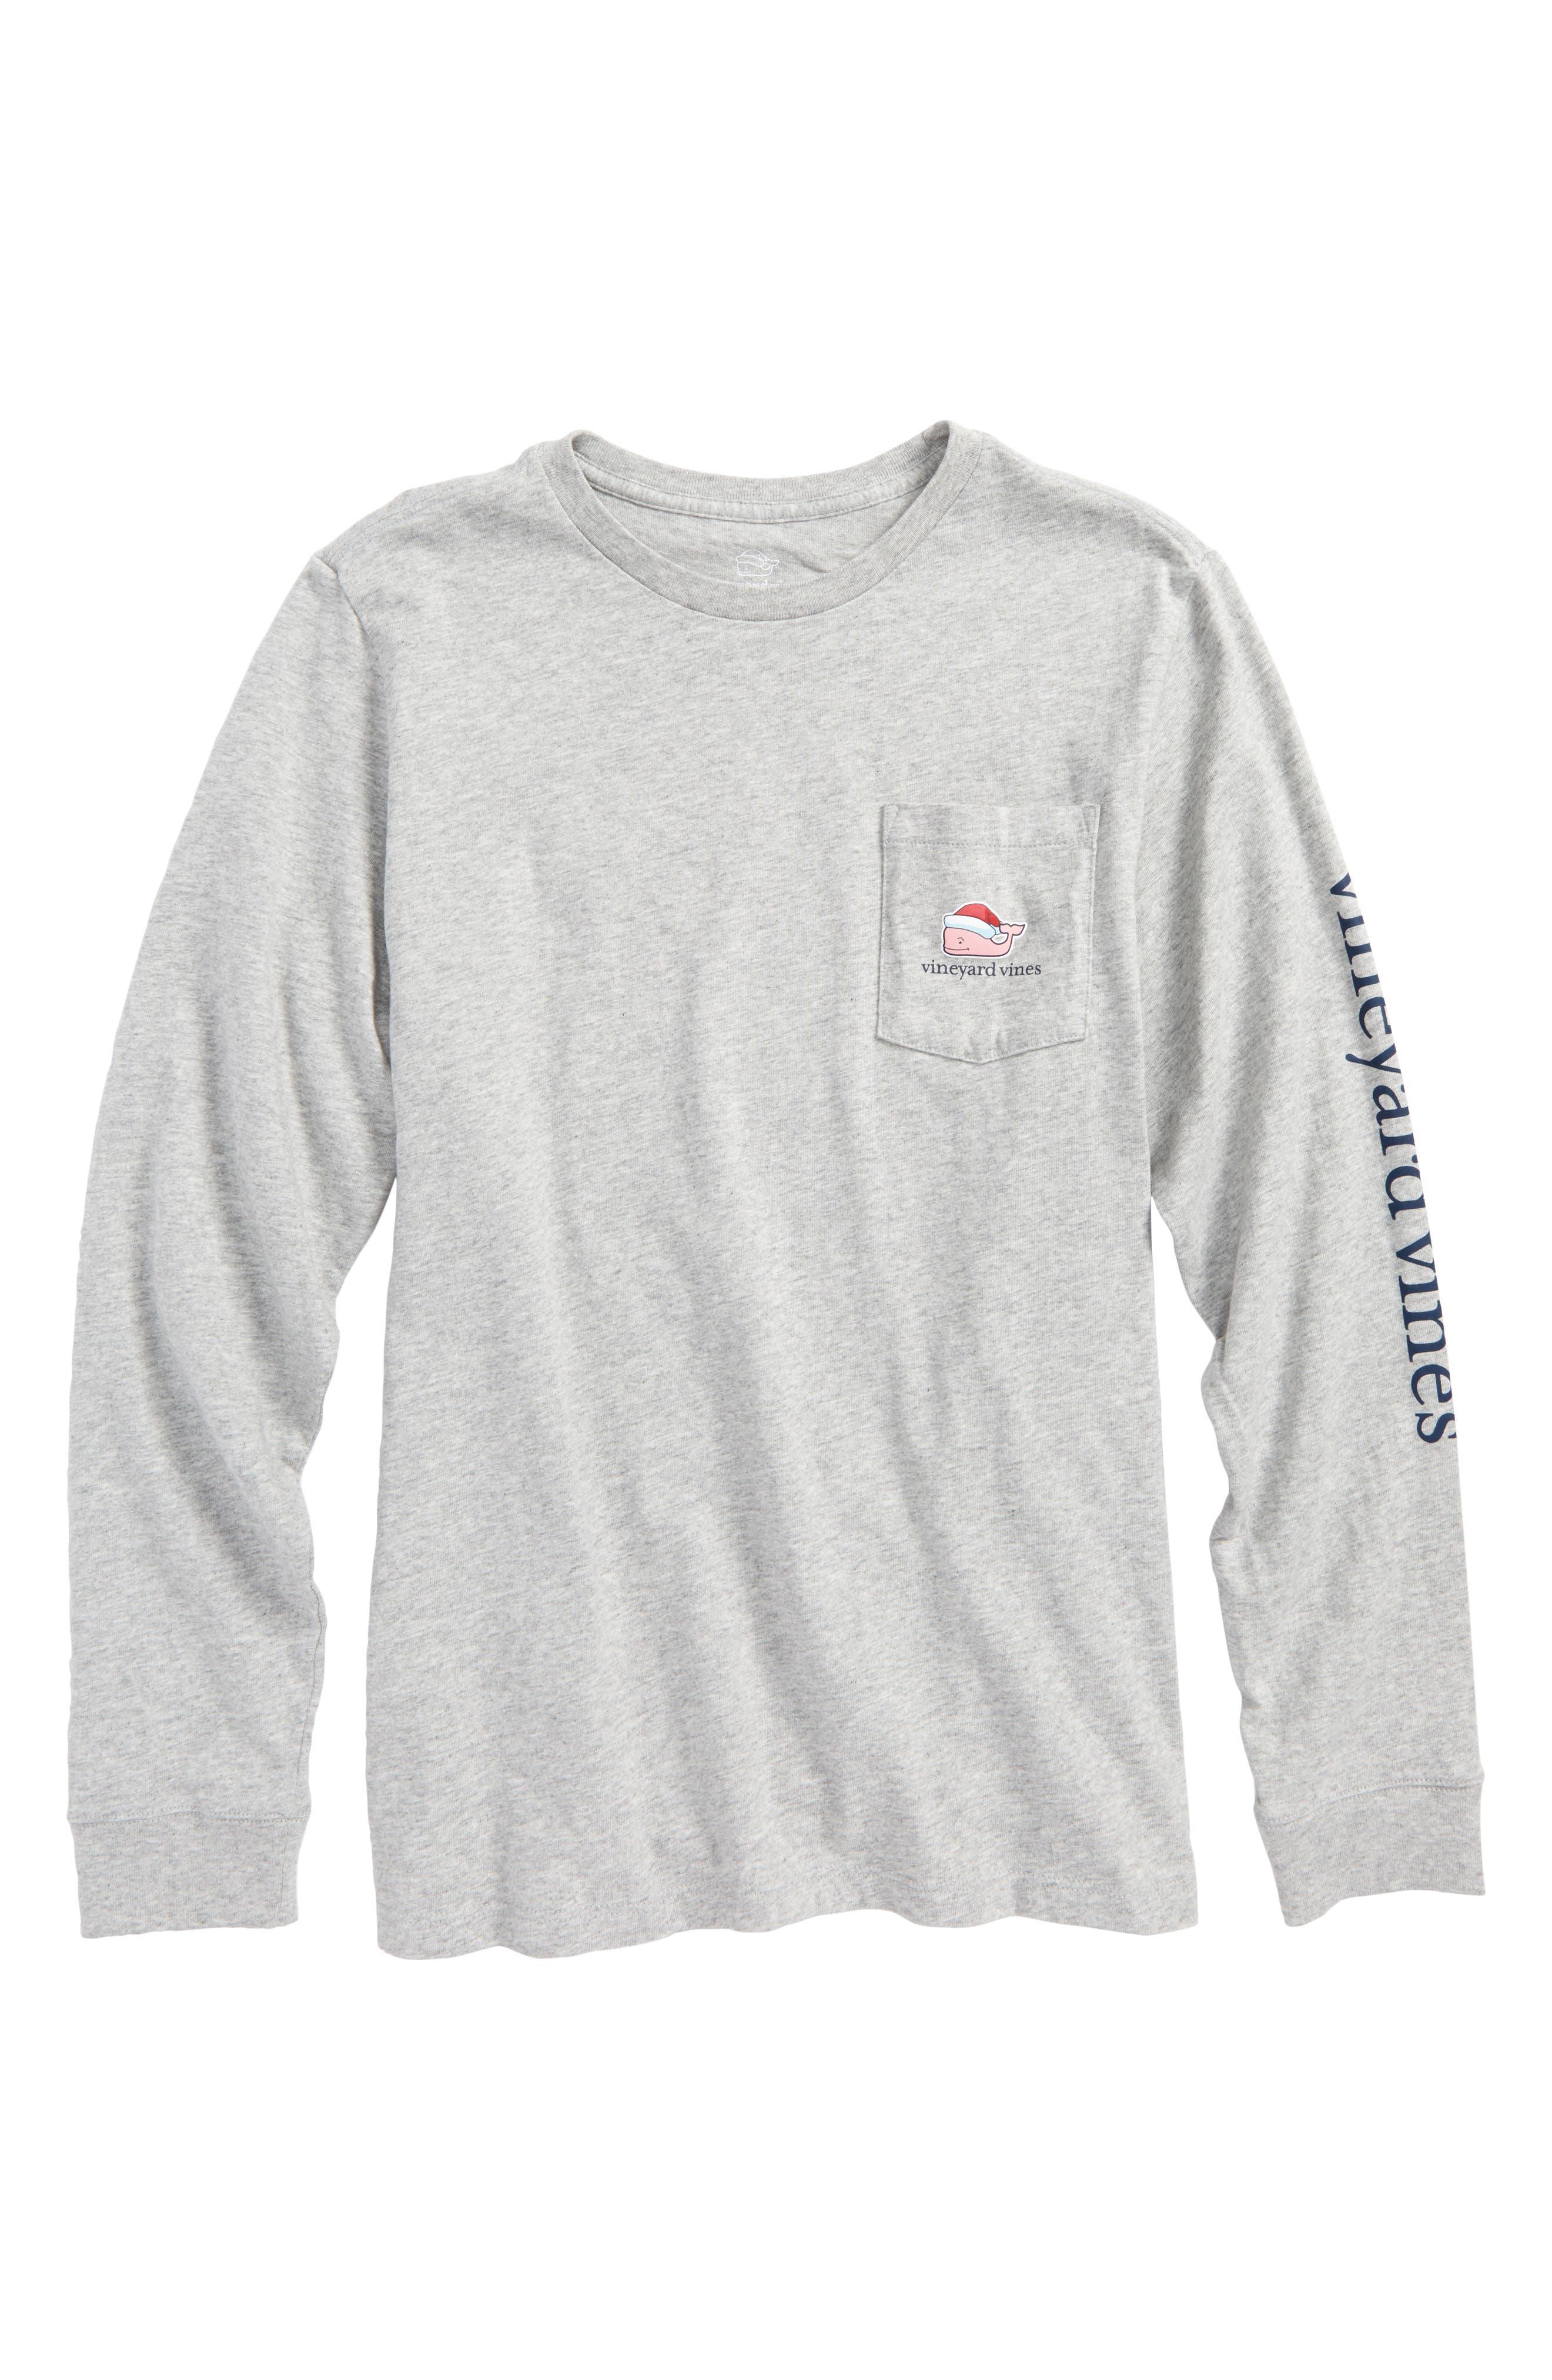 Santa Whale Happy Holidays 2017 T-Shirt,                         Main,                         color,